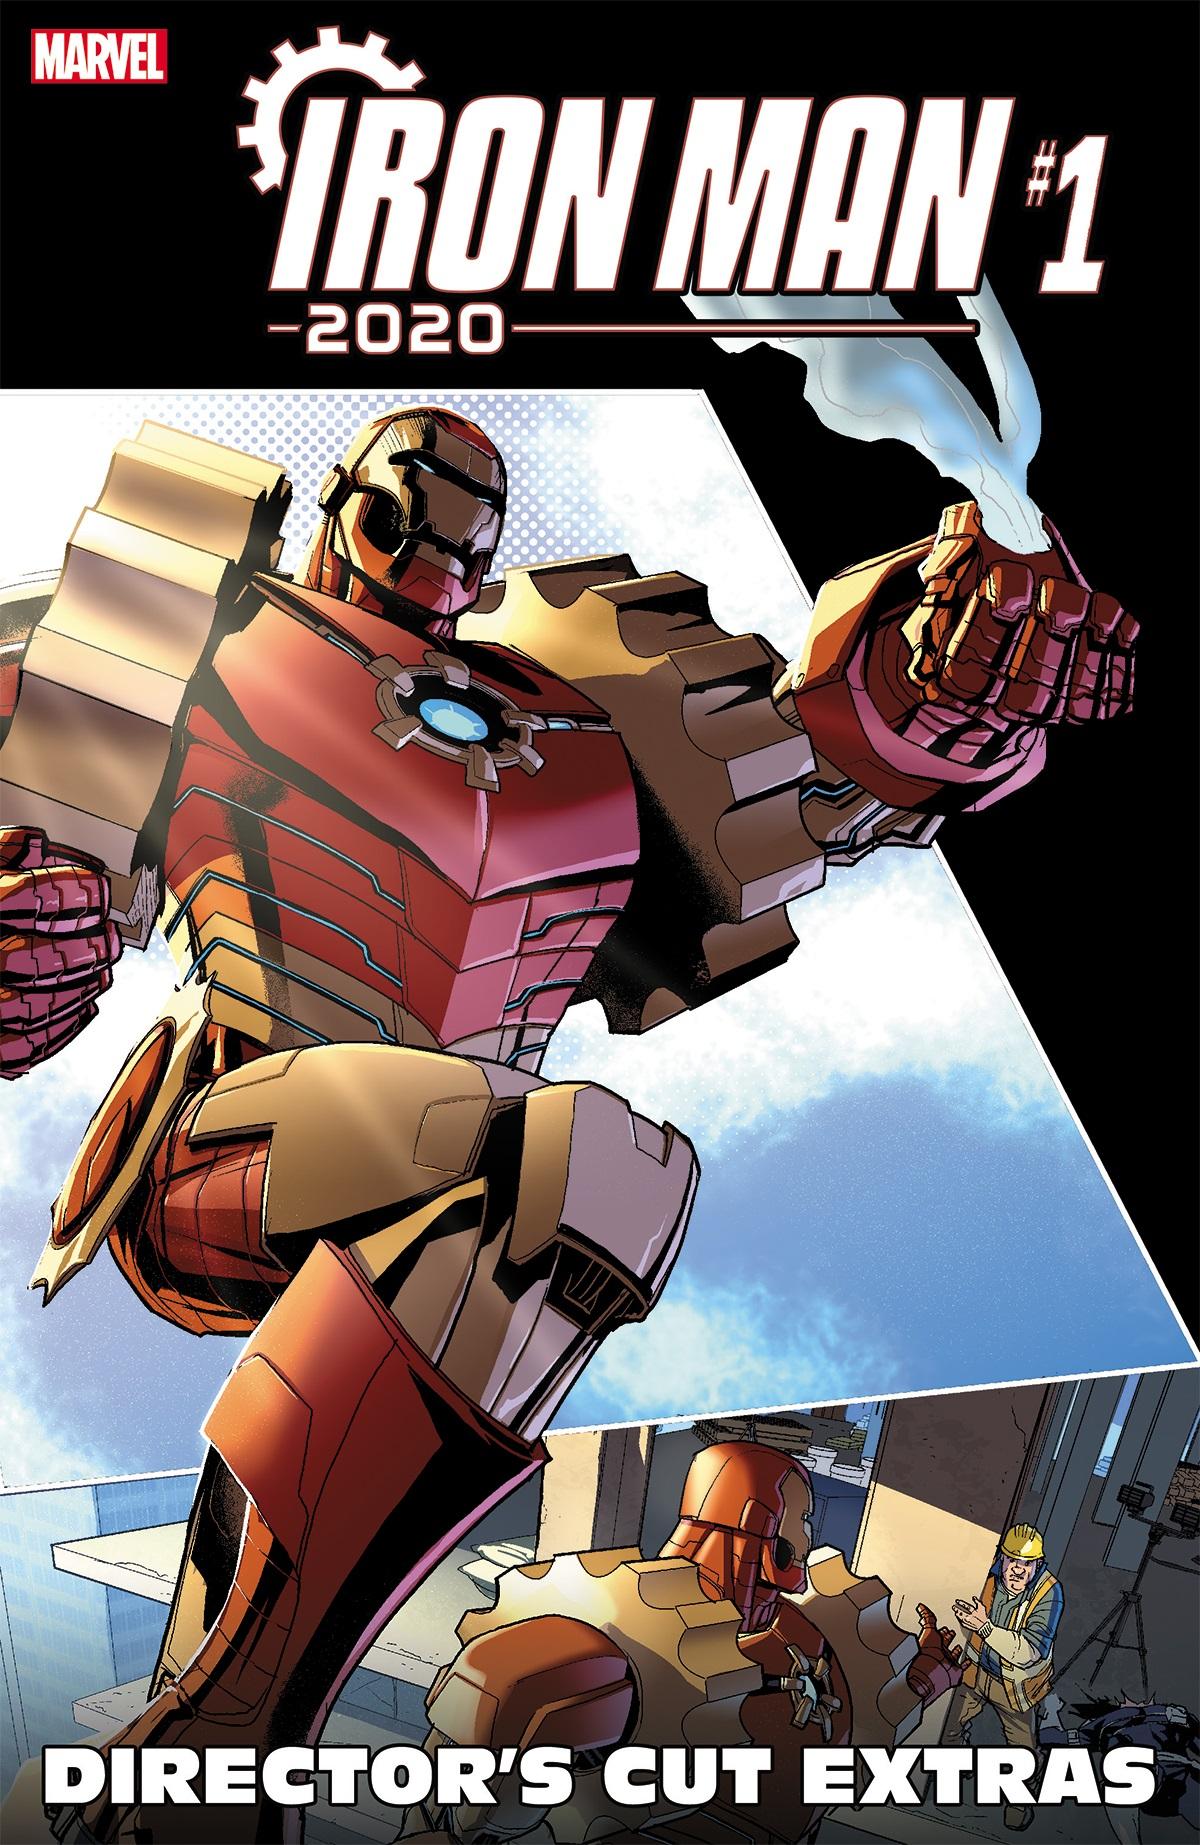 Iron Man 2020: Director's Cut Edition (2020) #1